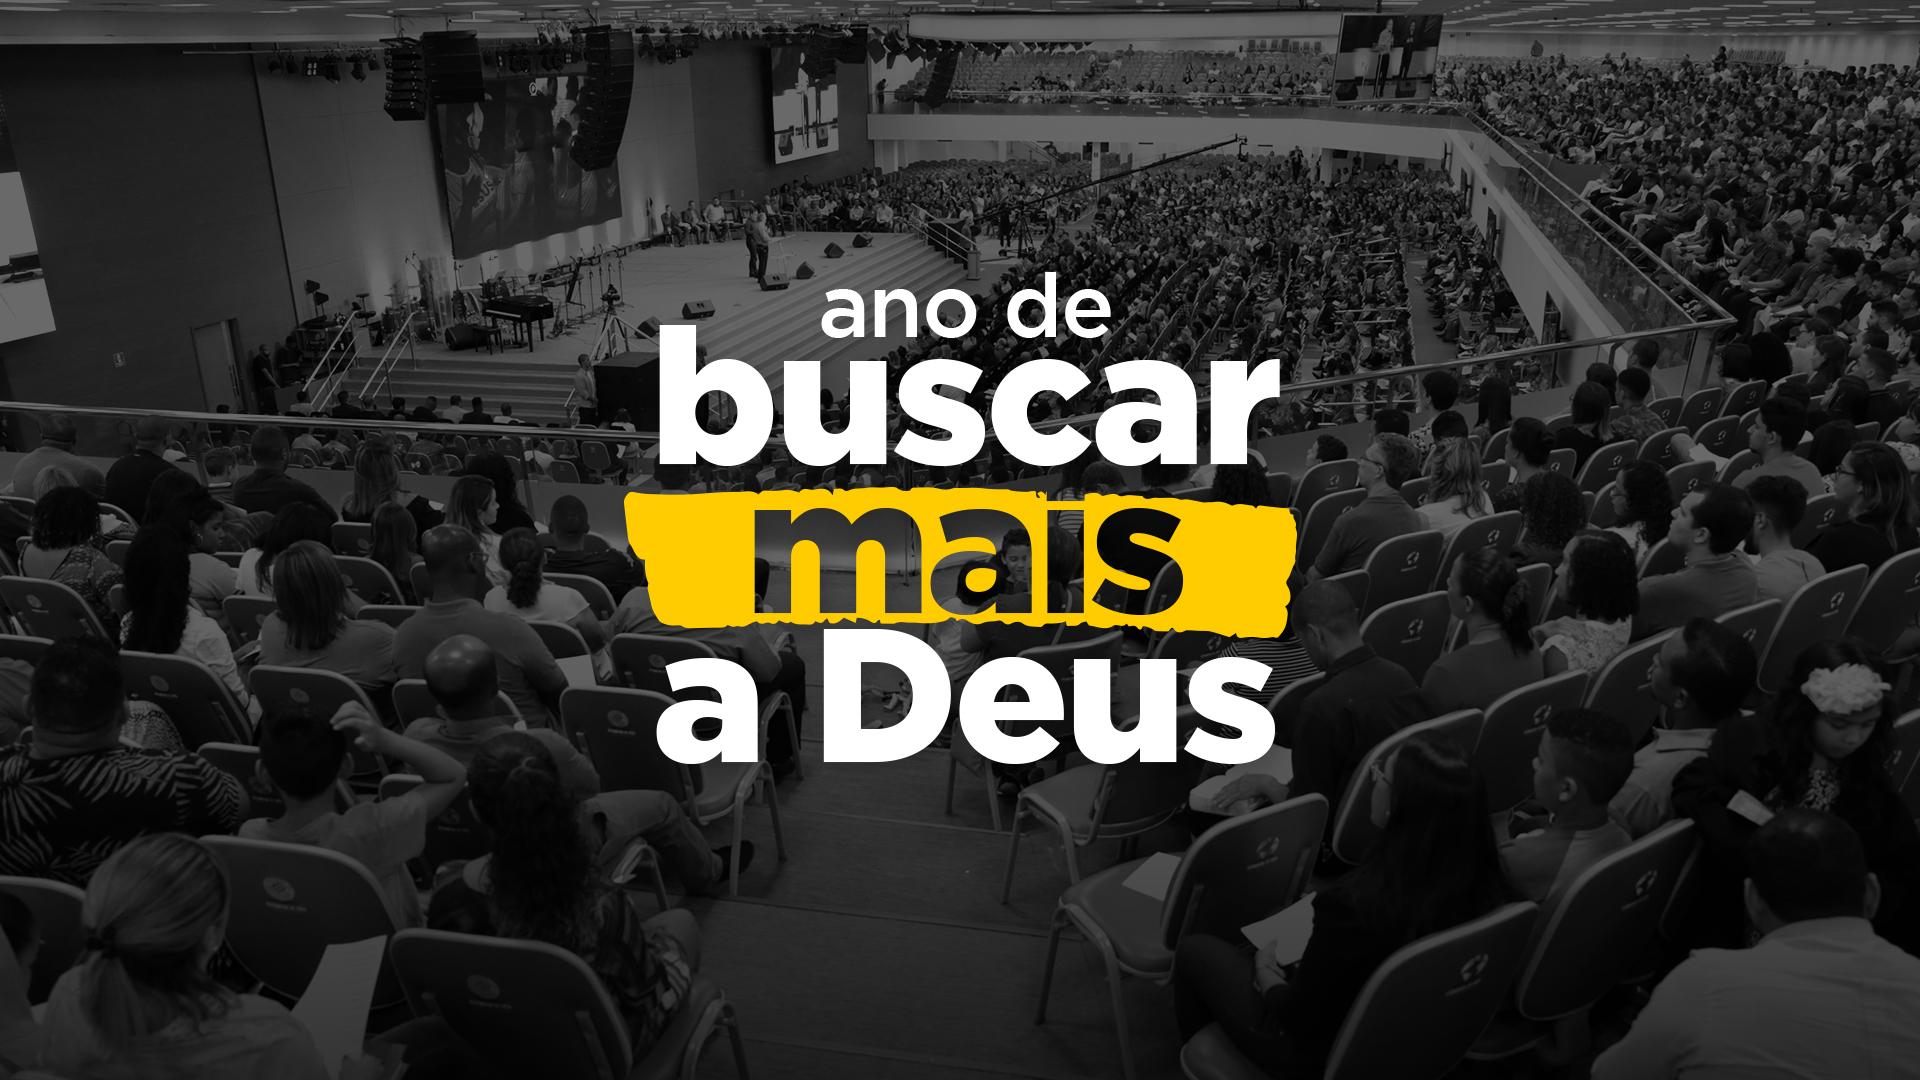 BuscarMais_FundoFinal.jpg